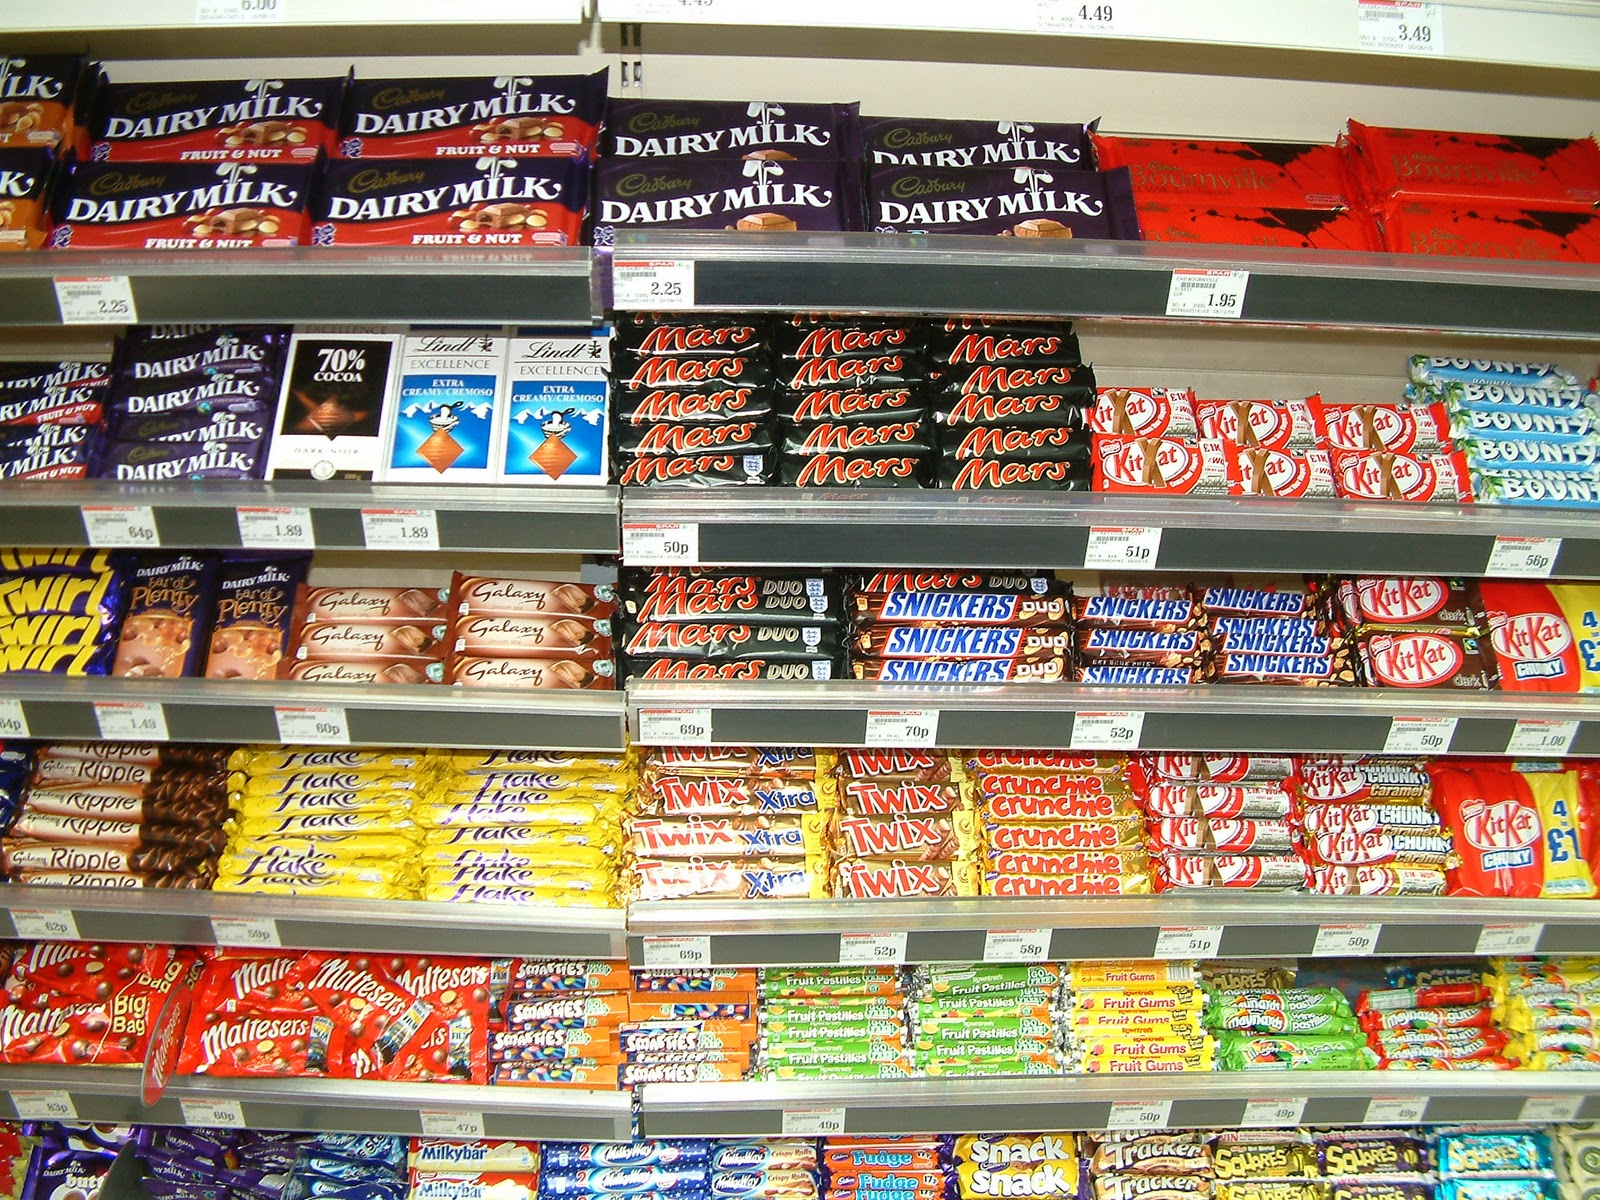 orkla confectionery & snacks sverige ab filipstad